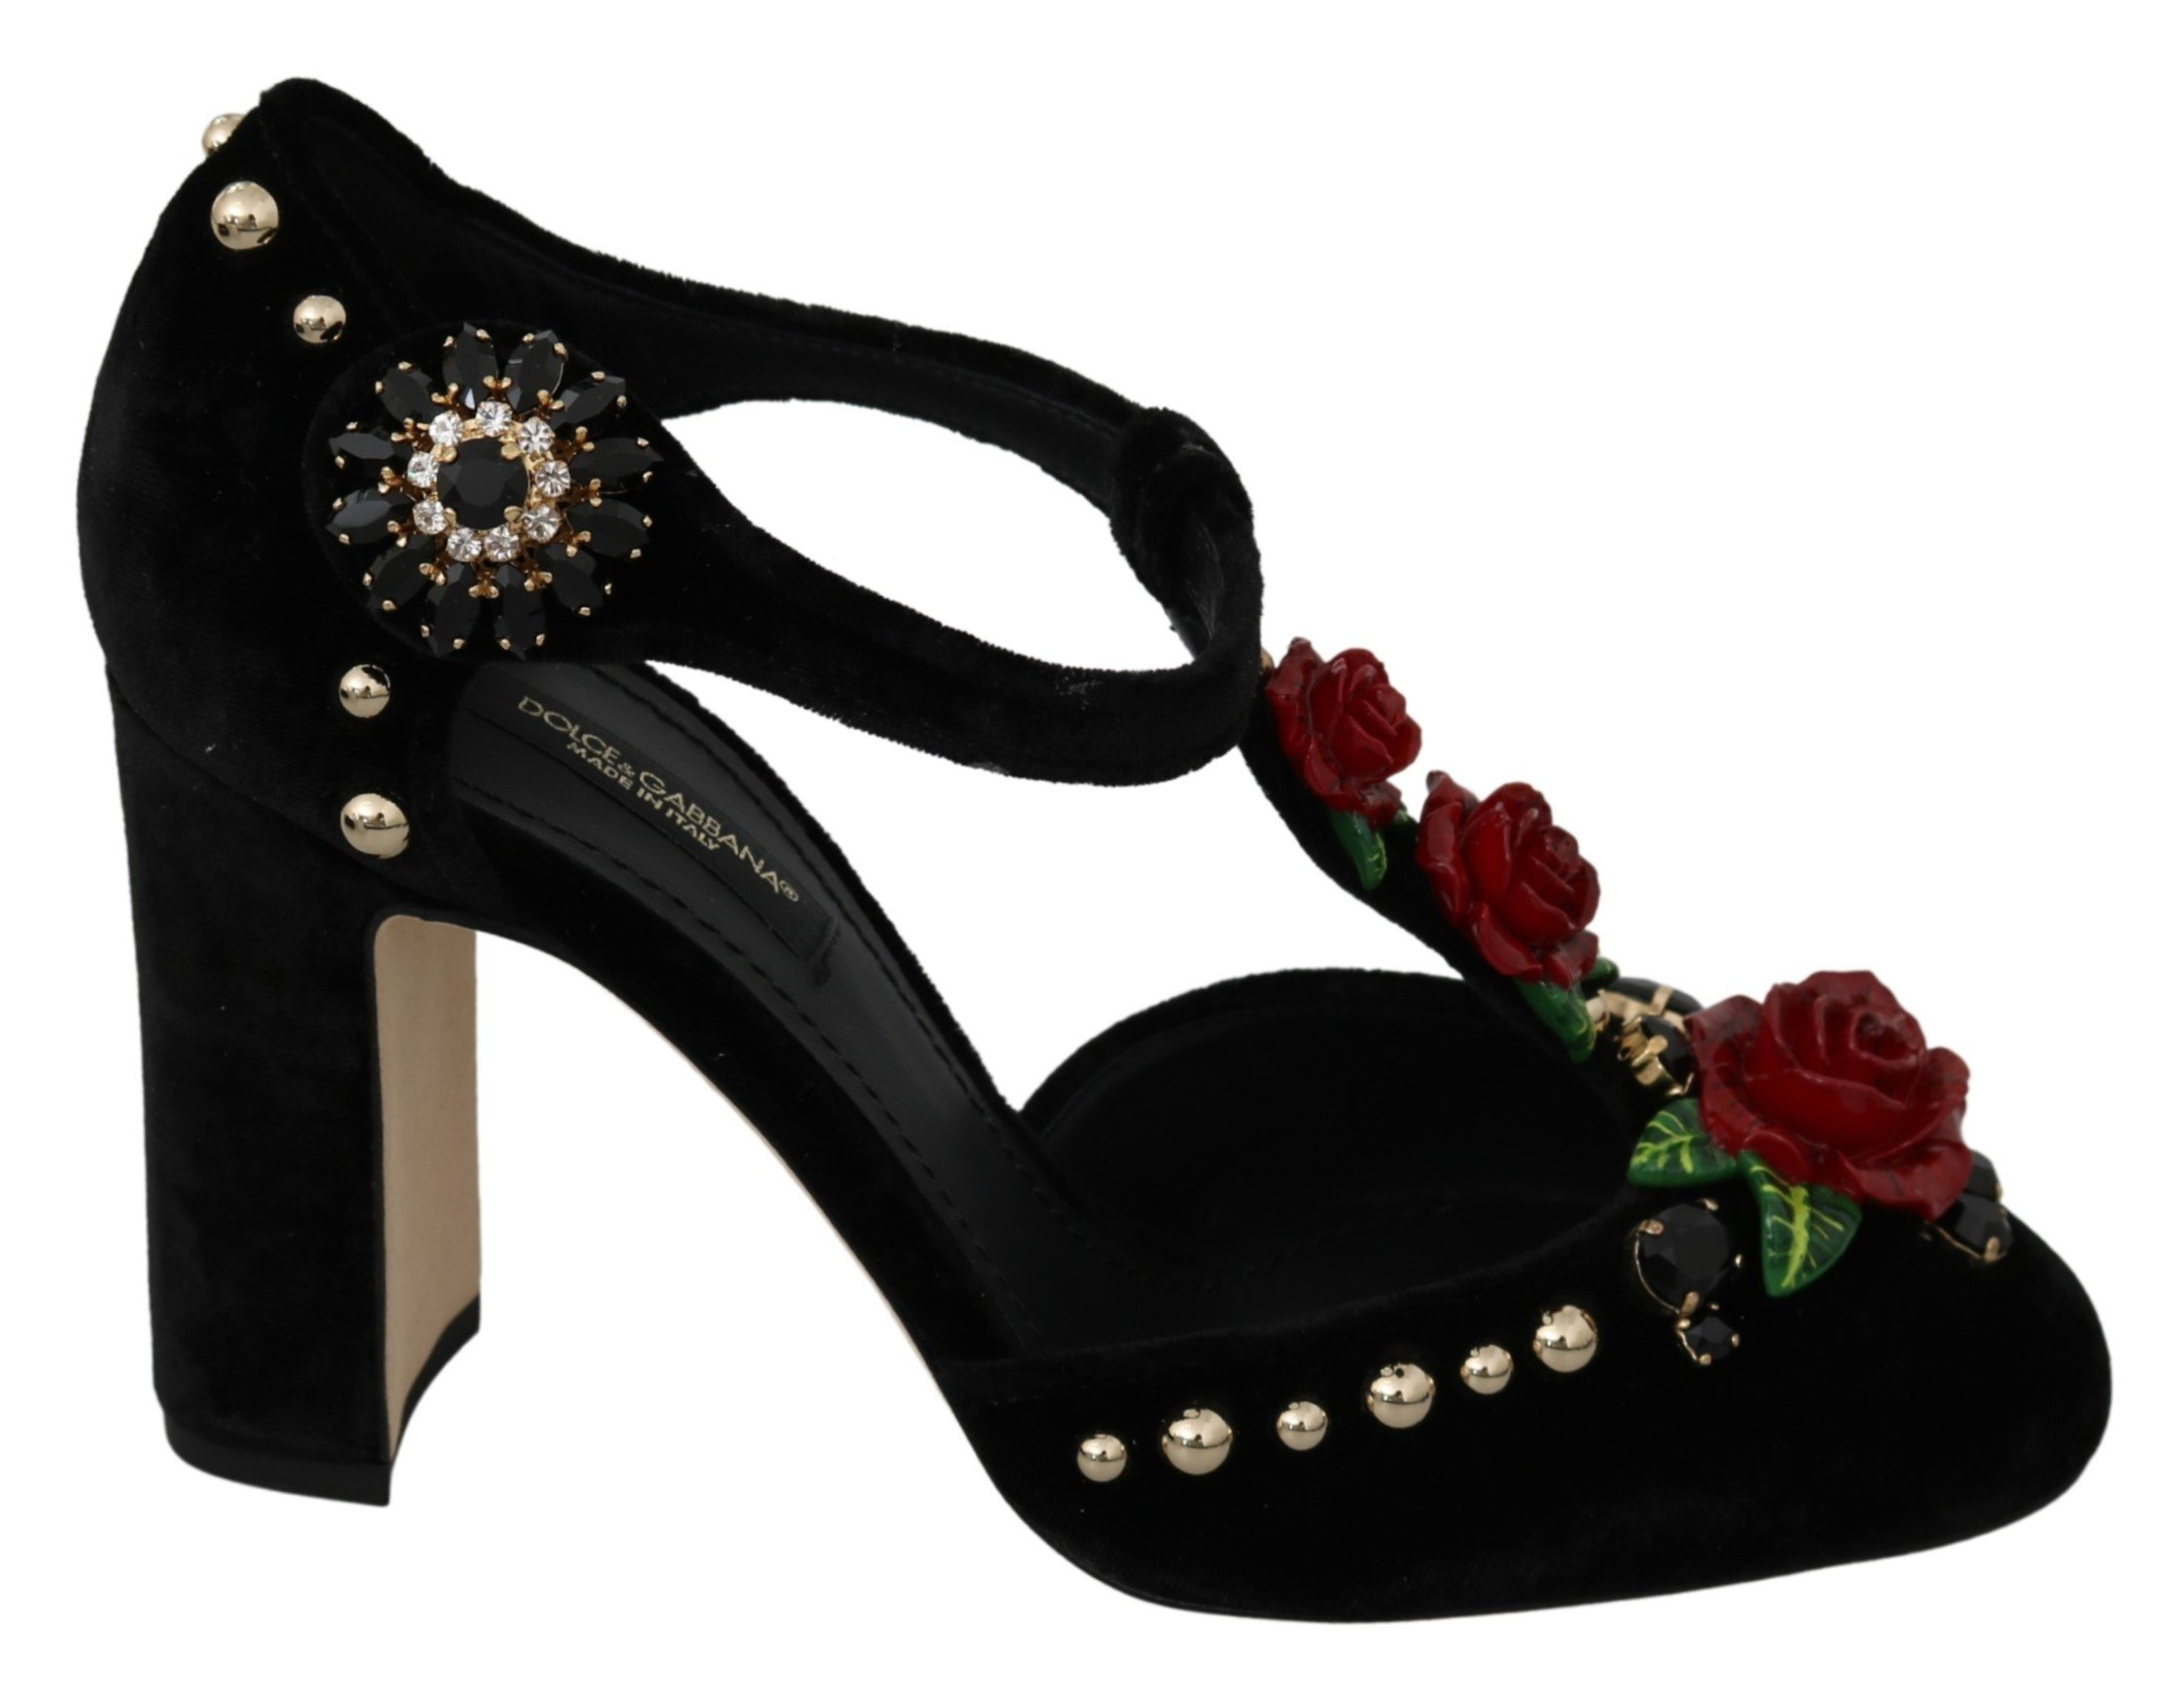 Dolce & Gabbana Women's Crystals Velvet Pumps Black LA7128 - EU35.5/US5